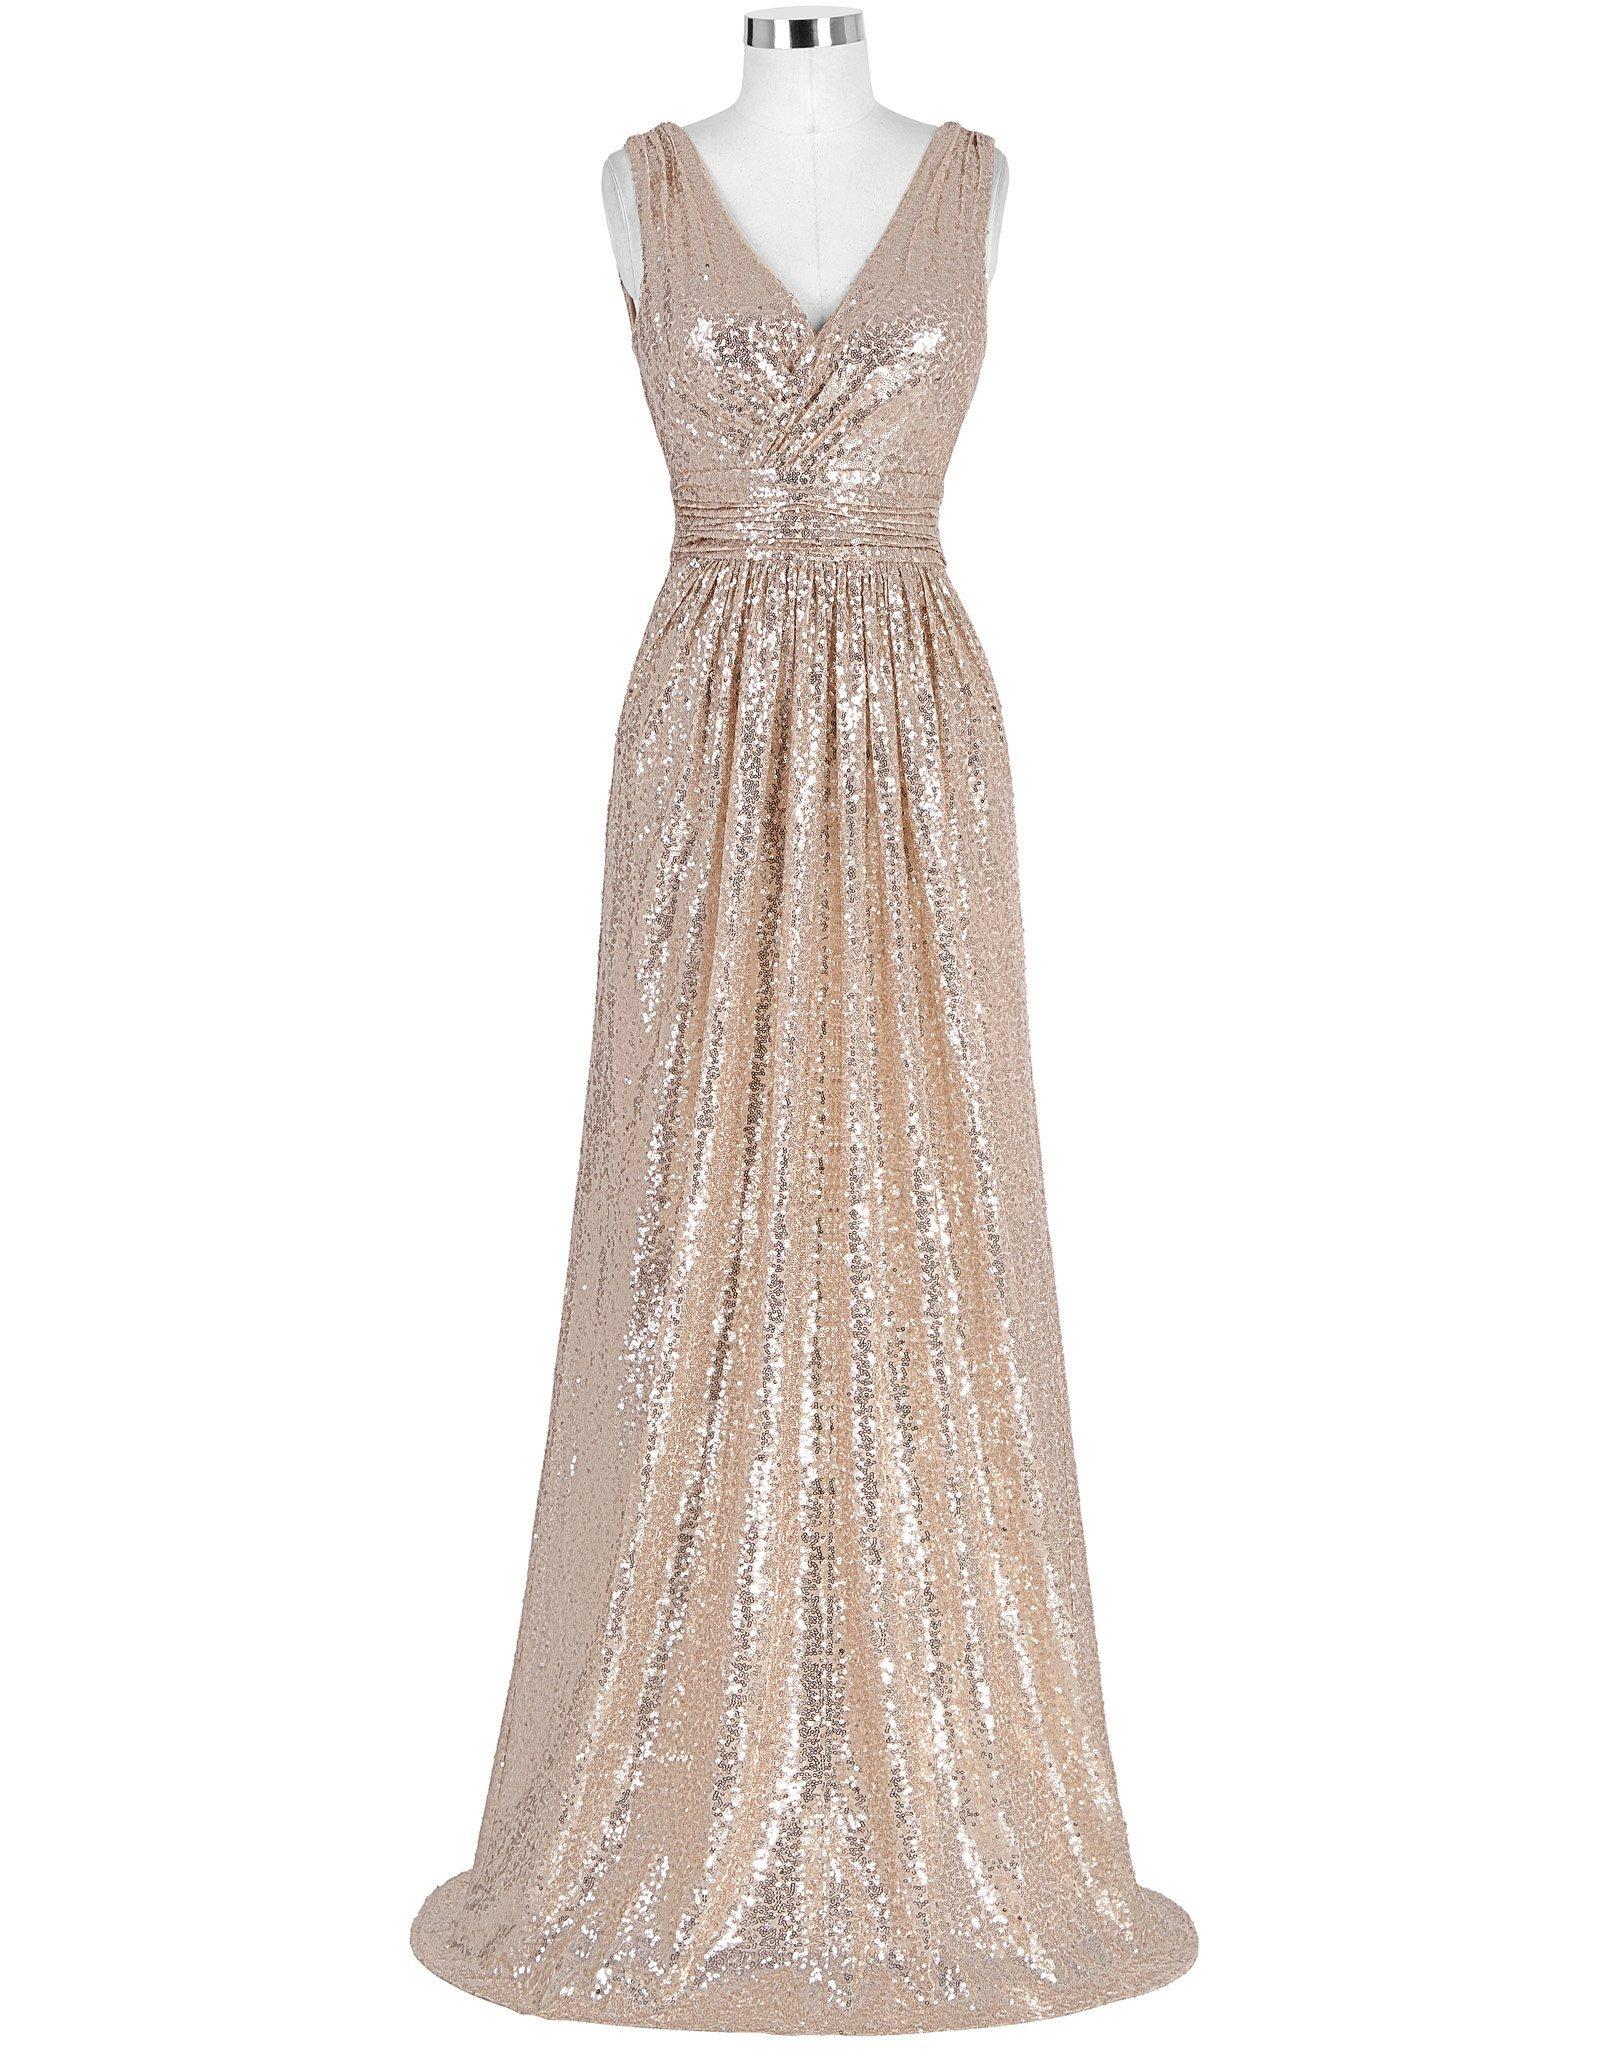 Kate Kasin Plus Size Homecoming Dress Formal Evening Party Dress Rose Gold Size 16 KK199 by Kate Kasin